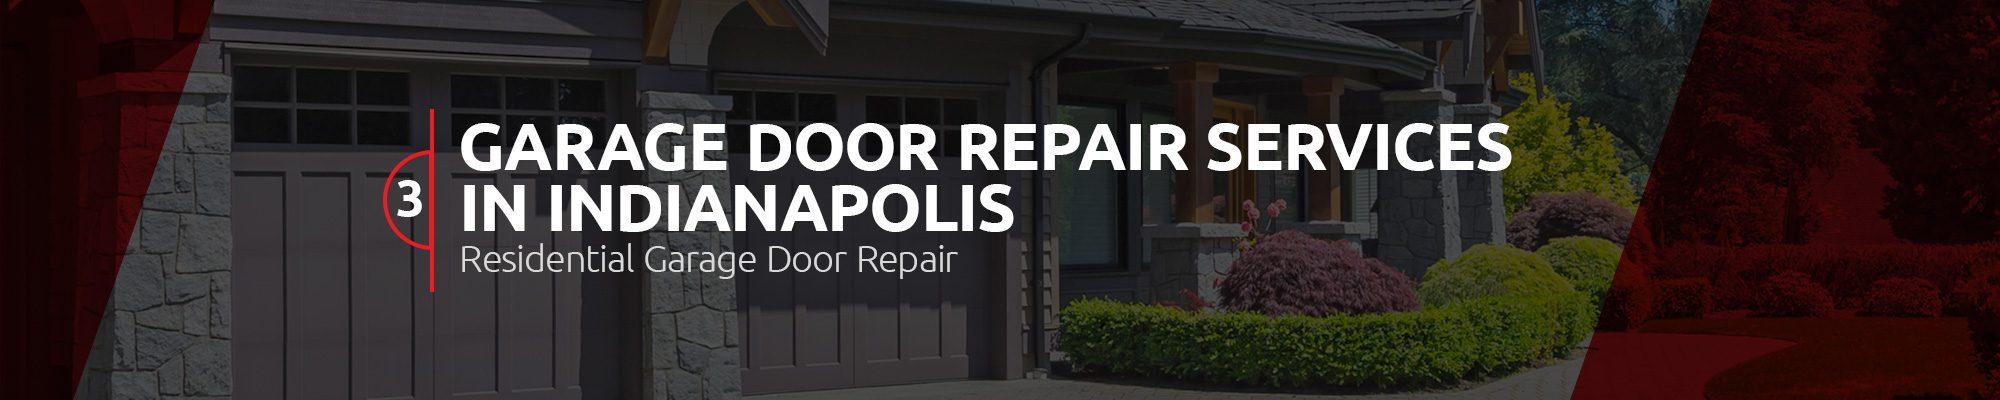 Garage Door Repair Indianapolis Schedule Your Free Consultation